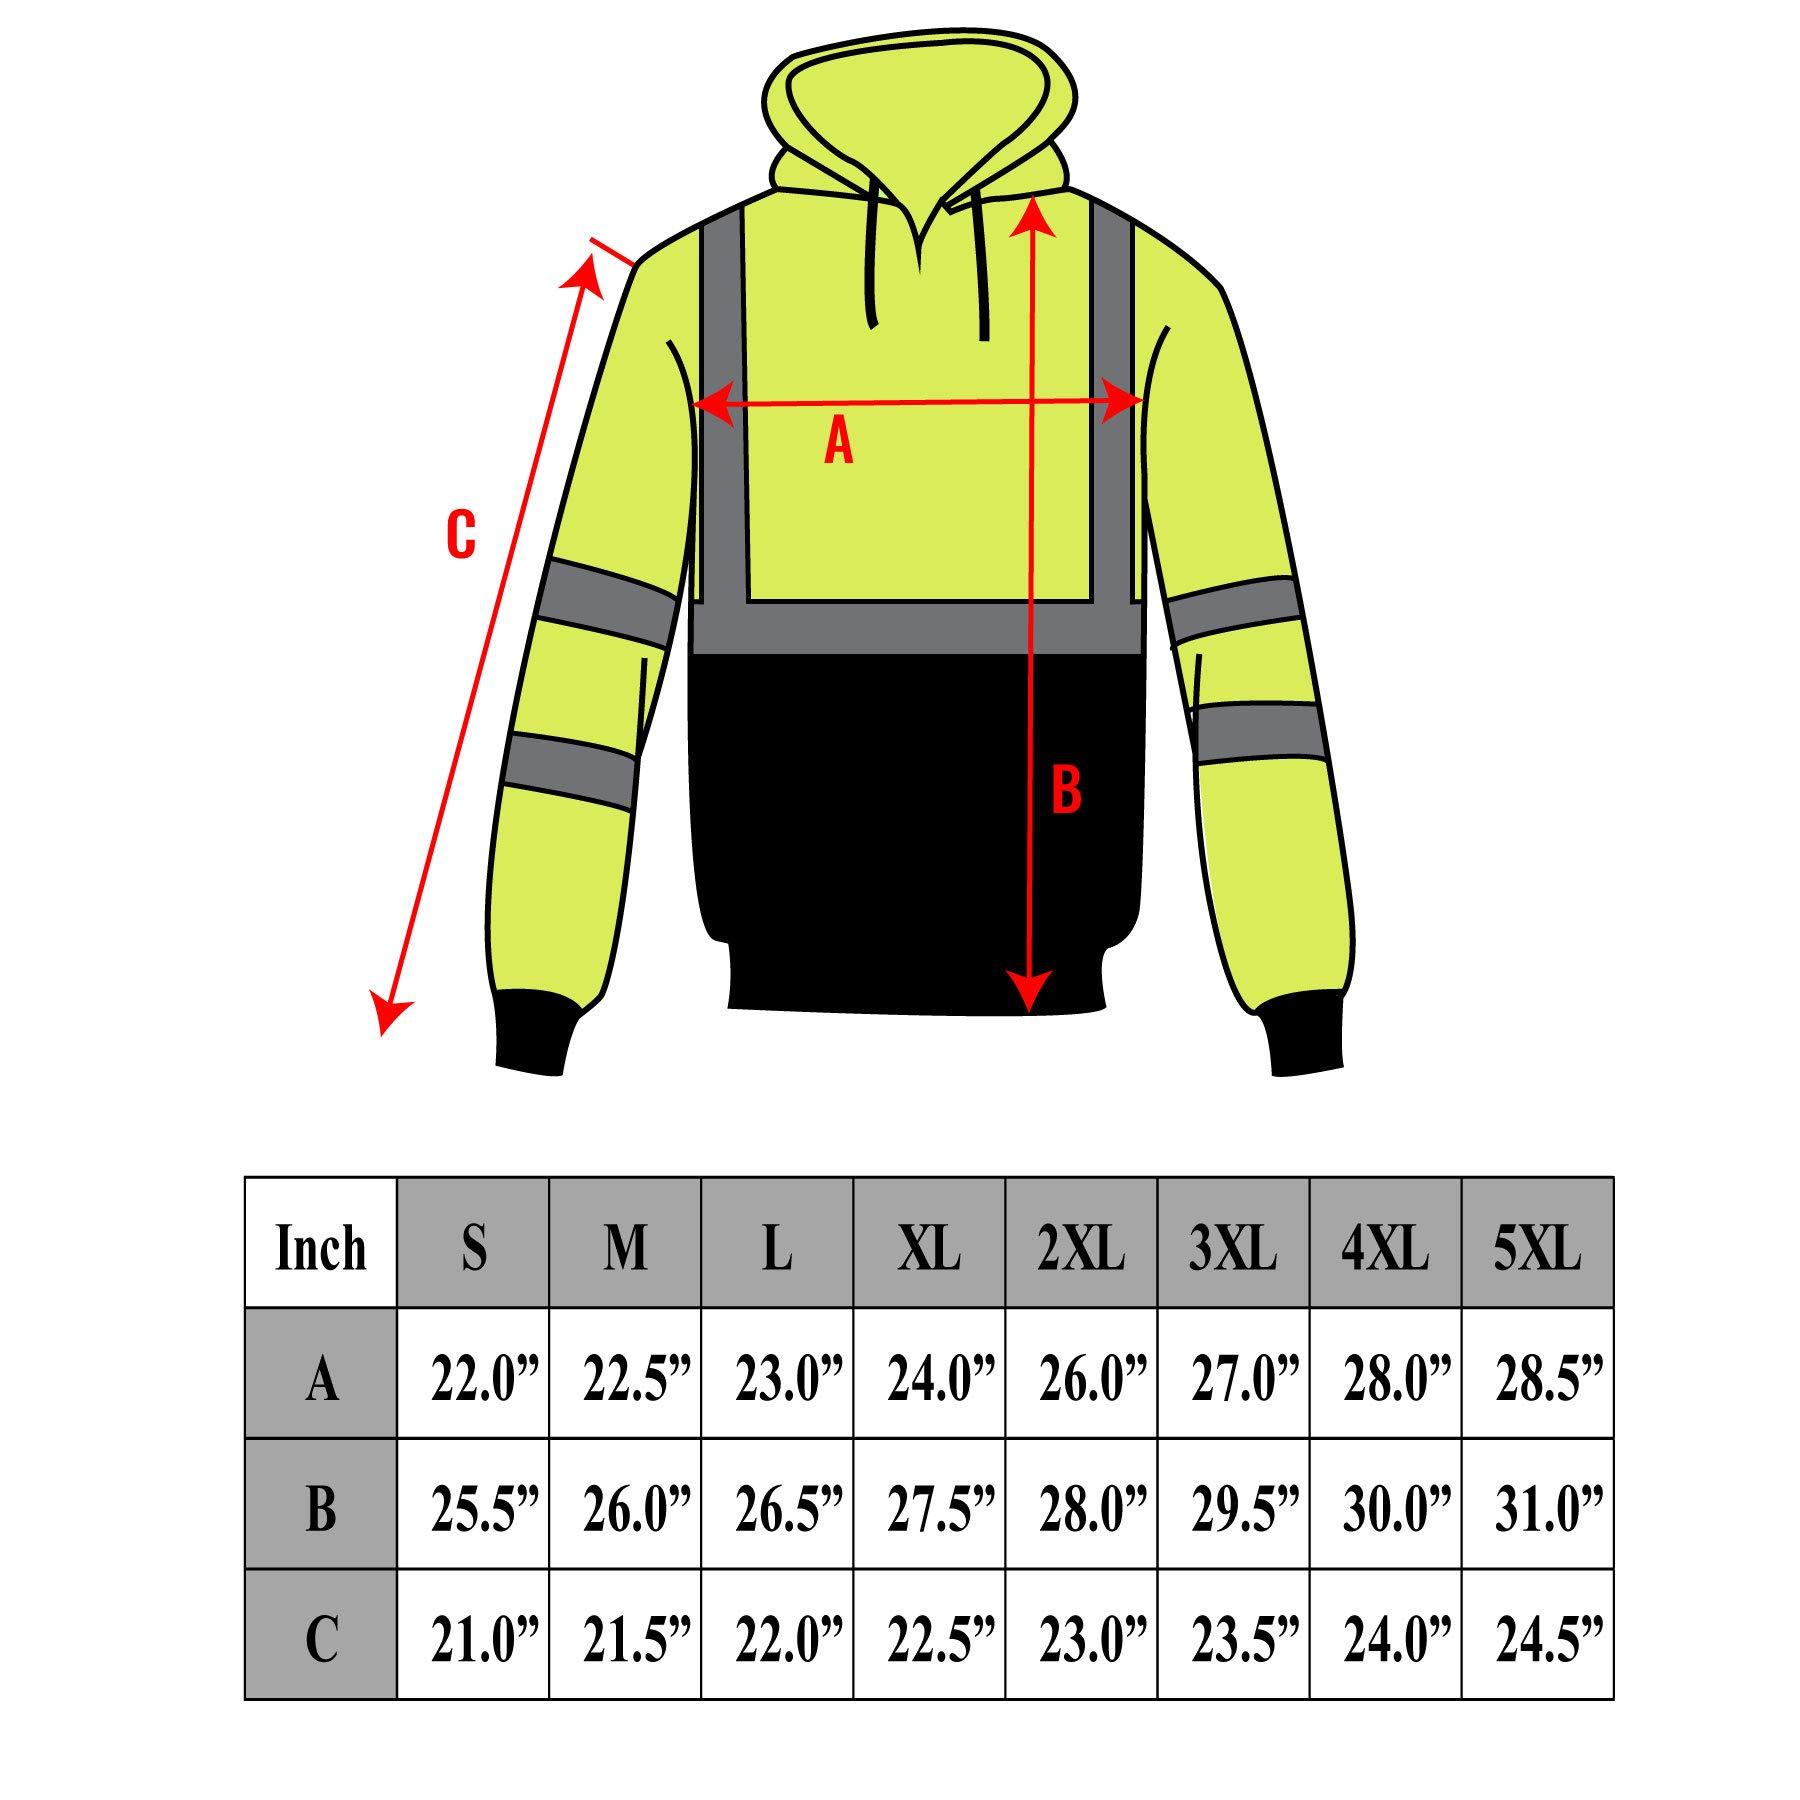 New York Hi-Viz Workwear H9012 Men's ANSI Class 3 High Visibility Class 3 Sweatshirt, Full Zip Hooded, Lightweight, Black Bottom (XX-Large) by New York Hi-Viz Workwear (Image #7)